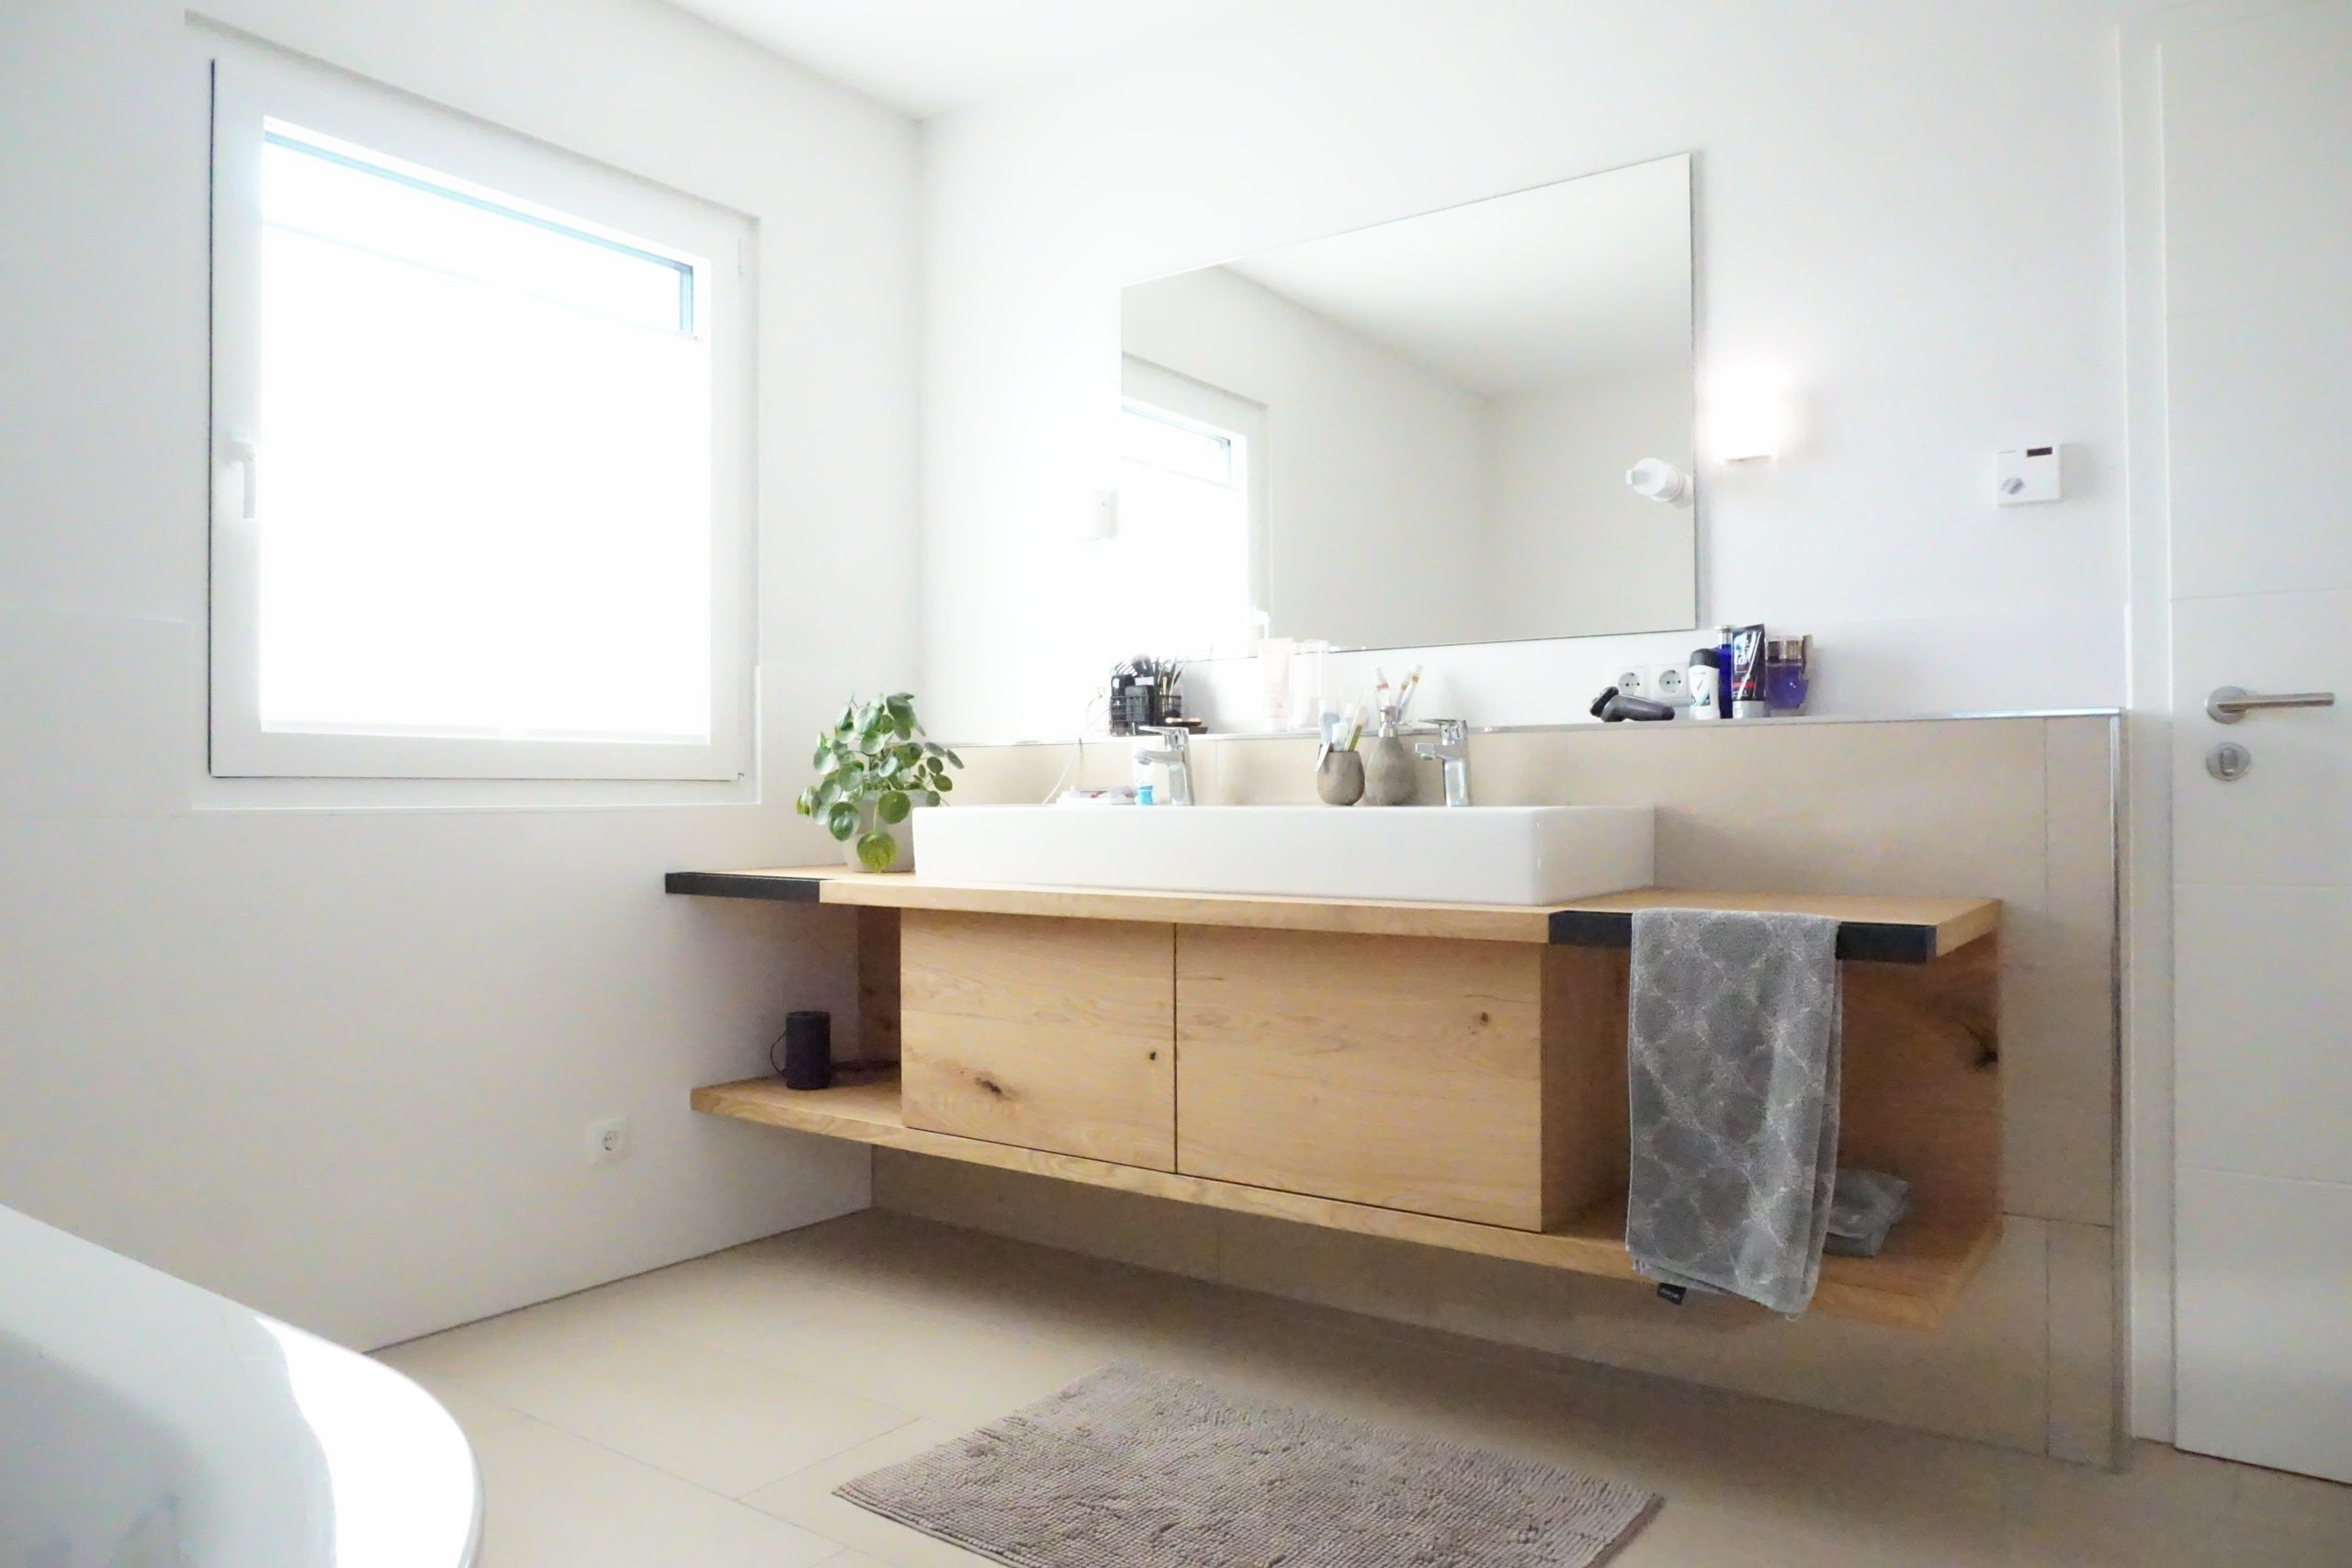 Badezimmer Möbel Handtuchhalter Bodensee Tettnang